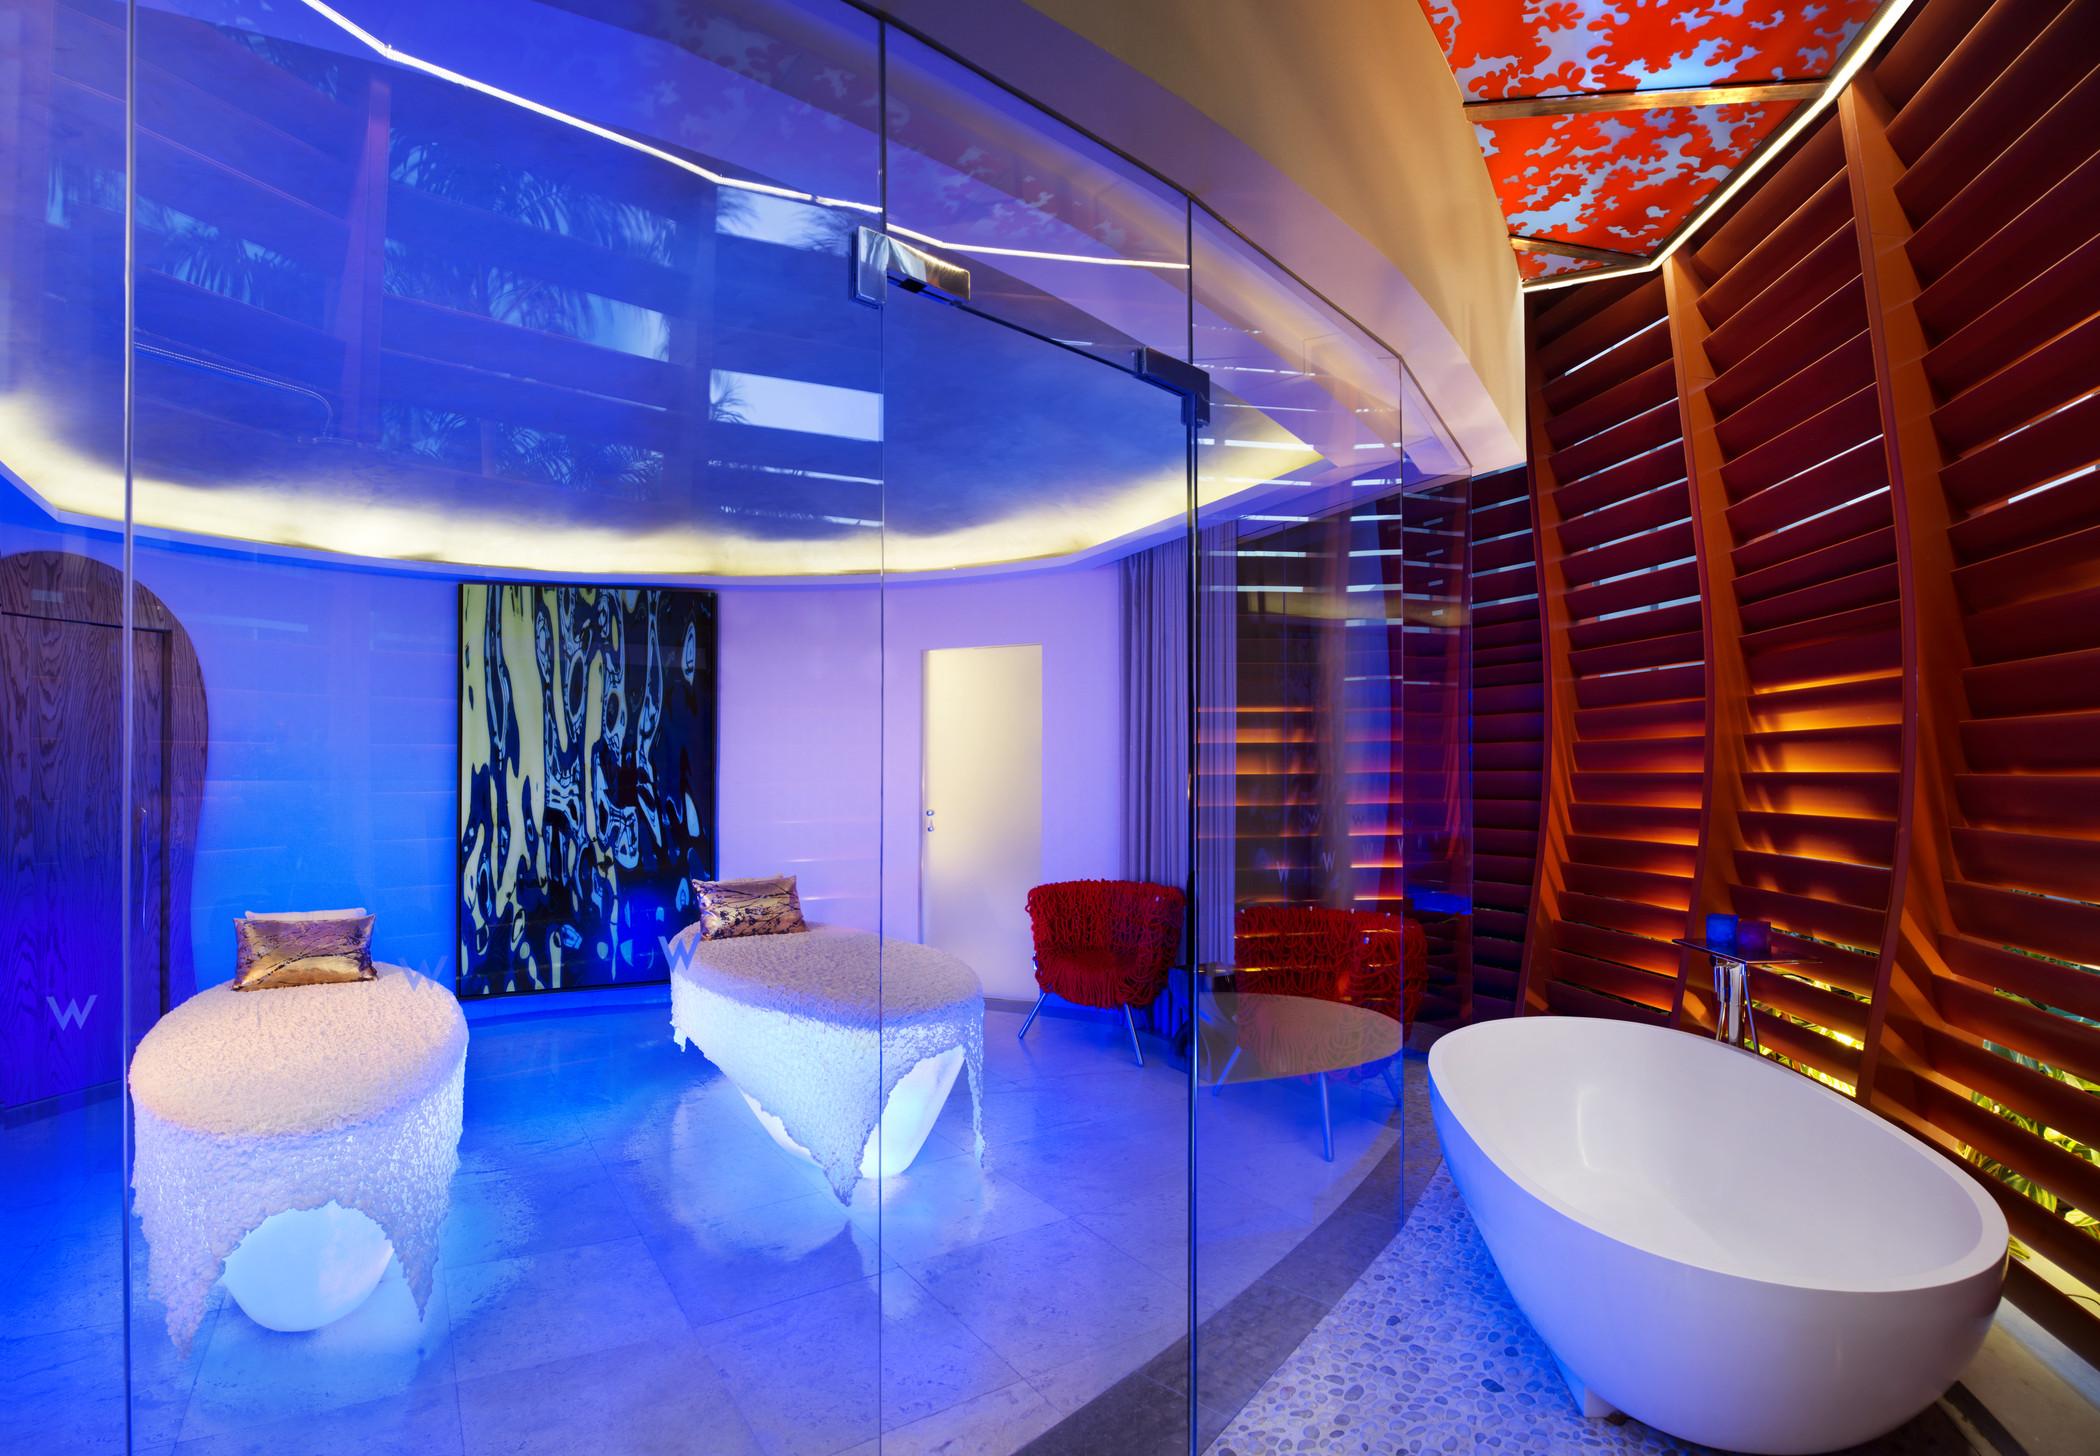 AWAY Spa treatment room